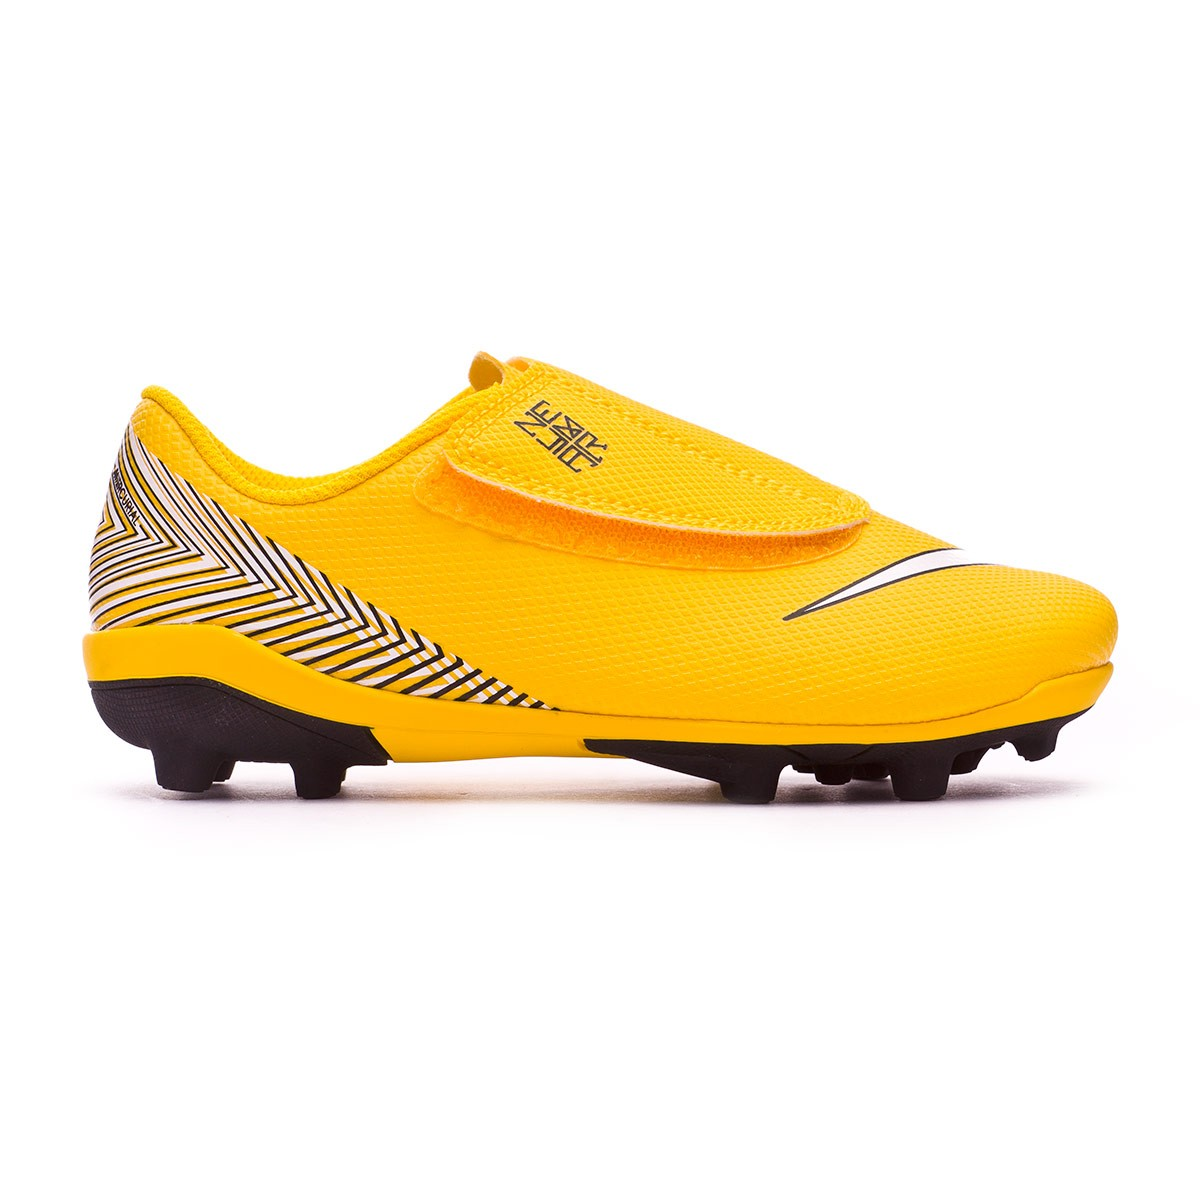 half off 8b6b8 f372d Scarpe Nike Mercurial Vapor XII Club MG Neymar Junior Yellow-Black -  Negozio di calcio Fútbol Emotion